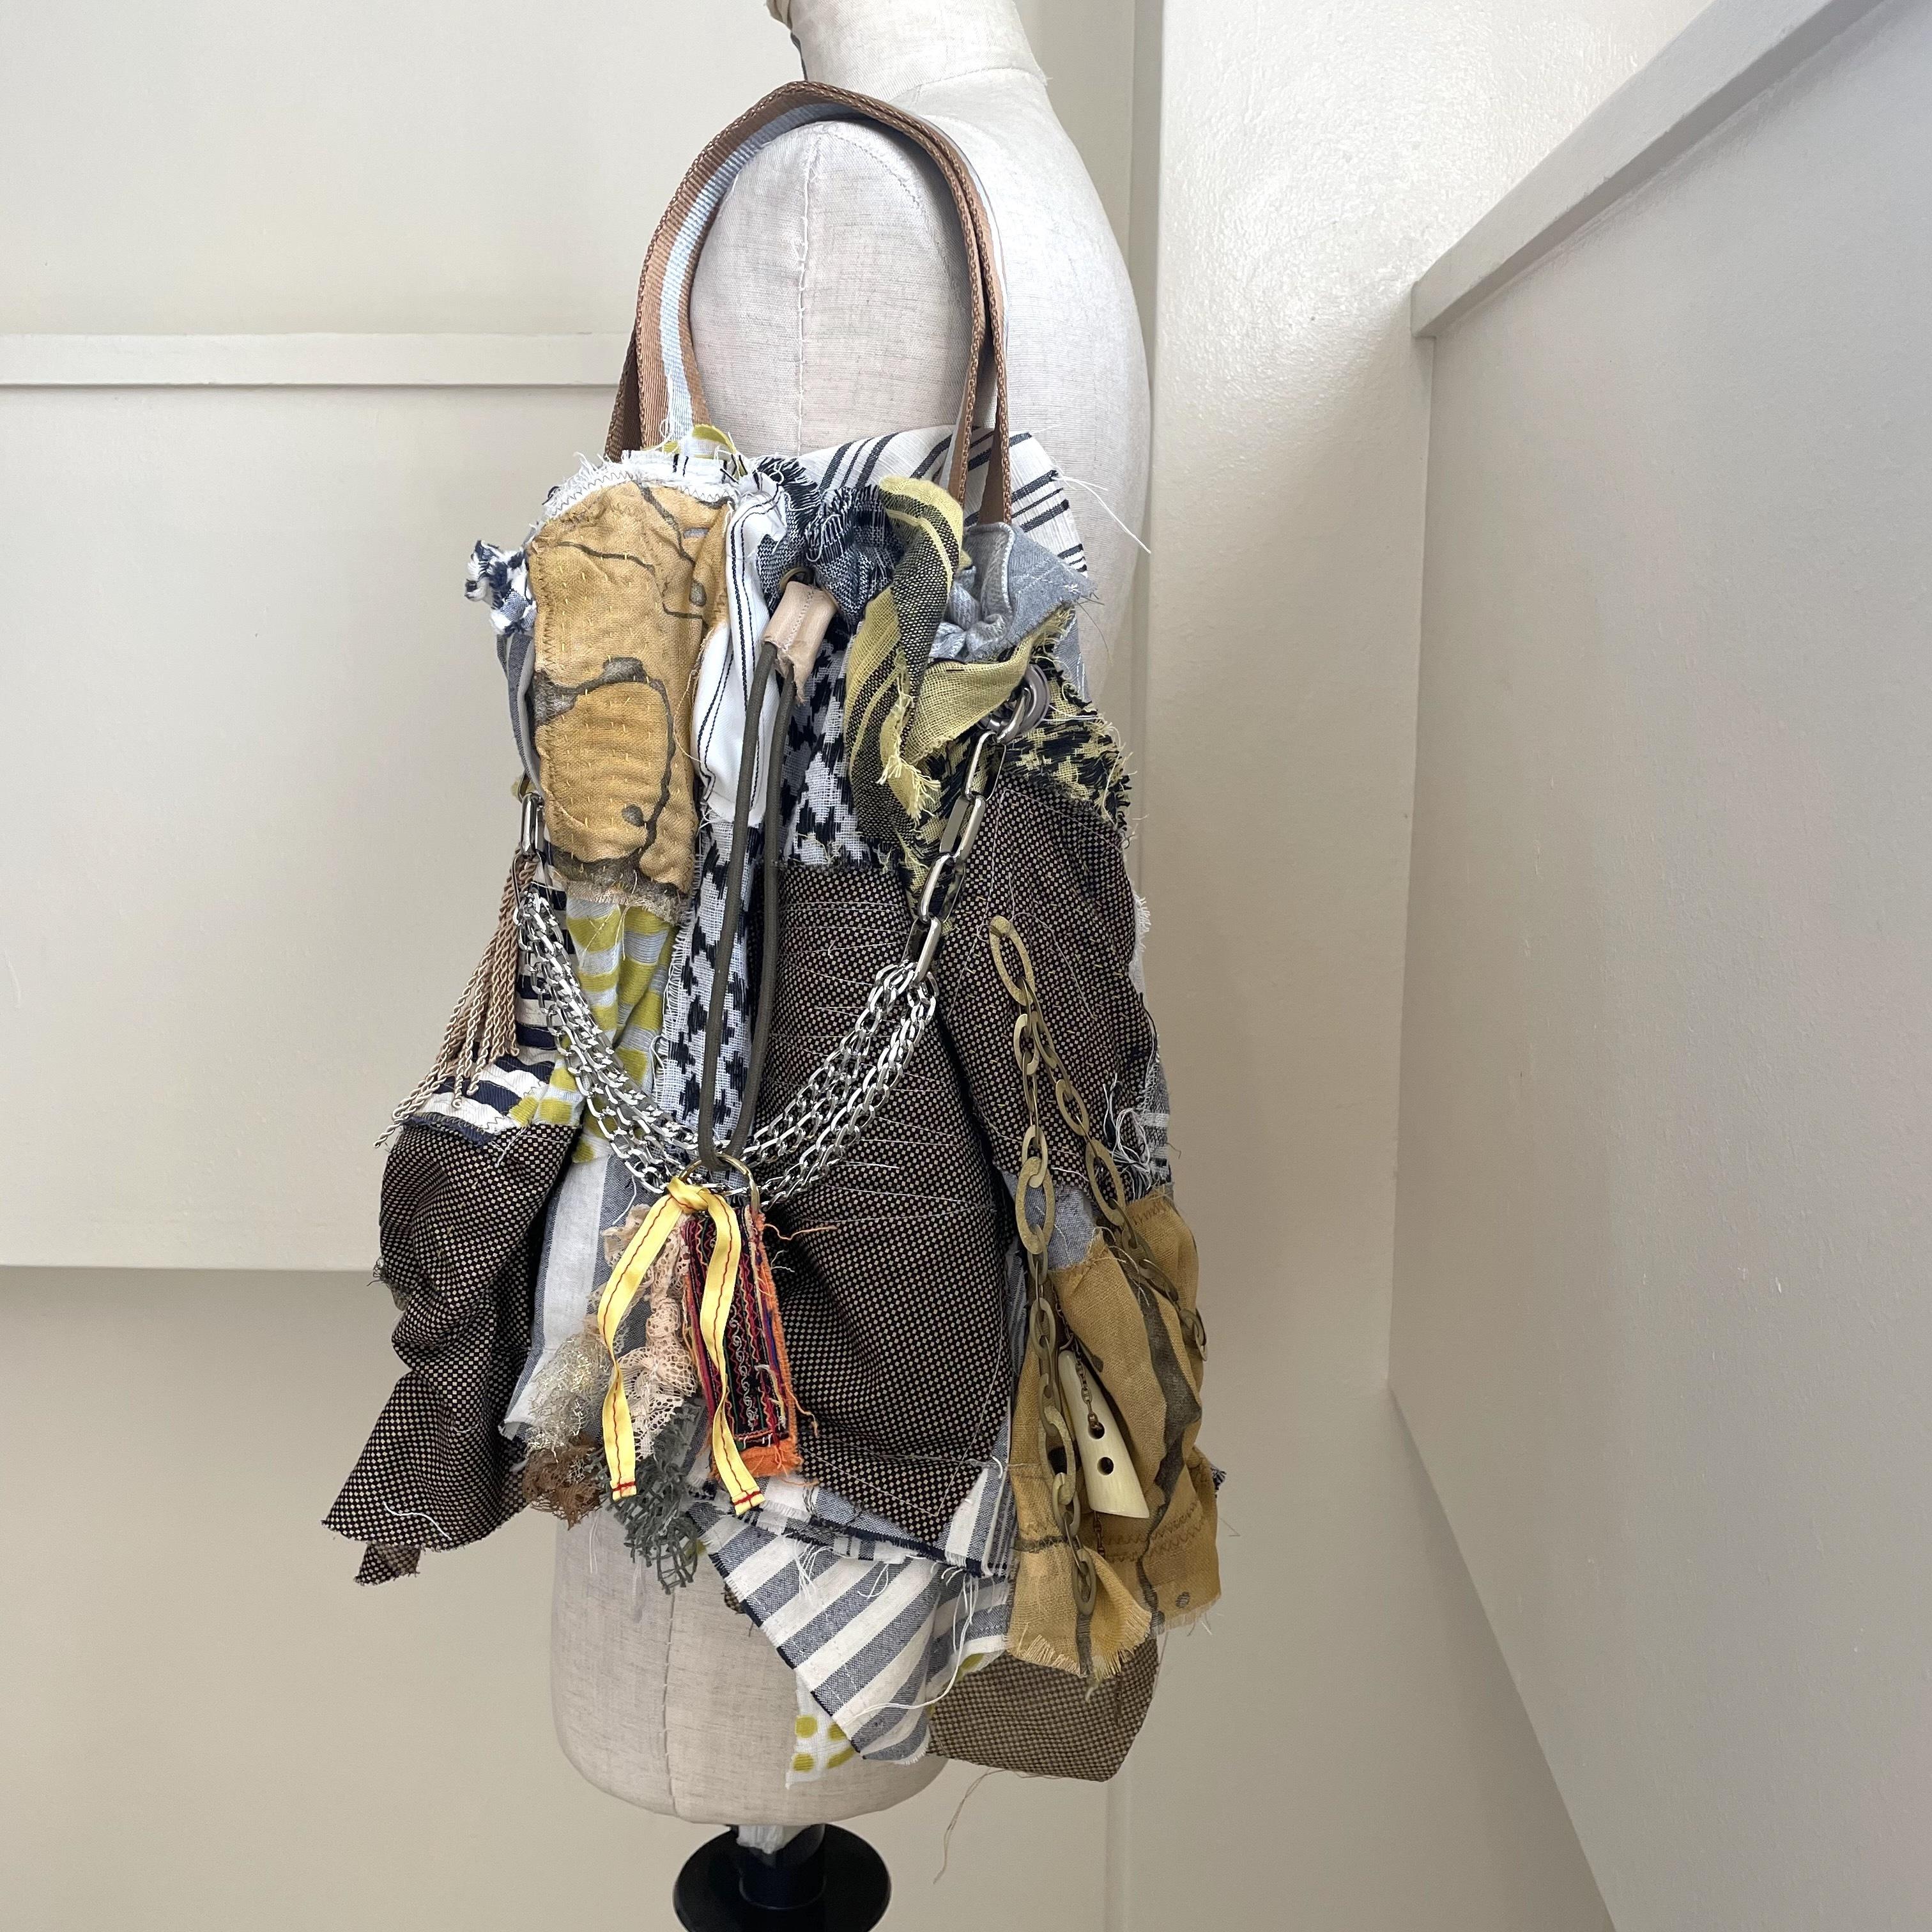 【sandglass】custom afghan bag / 【サンドグラス】カスタム アフガンバッグ